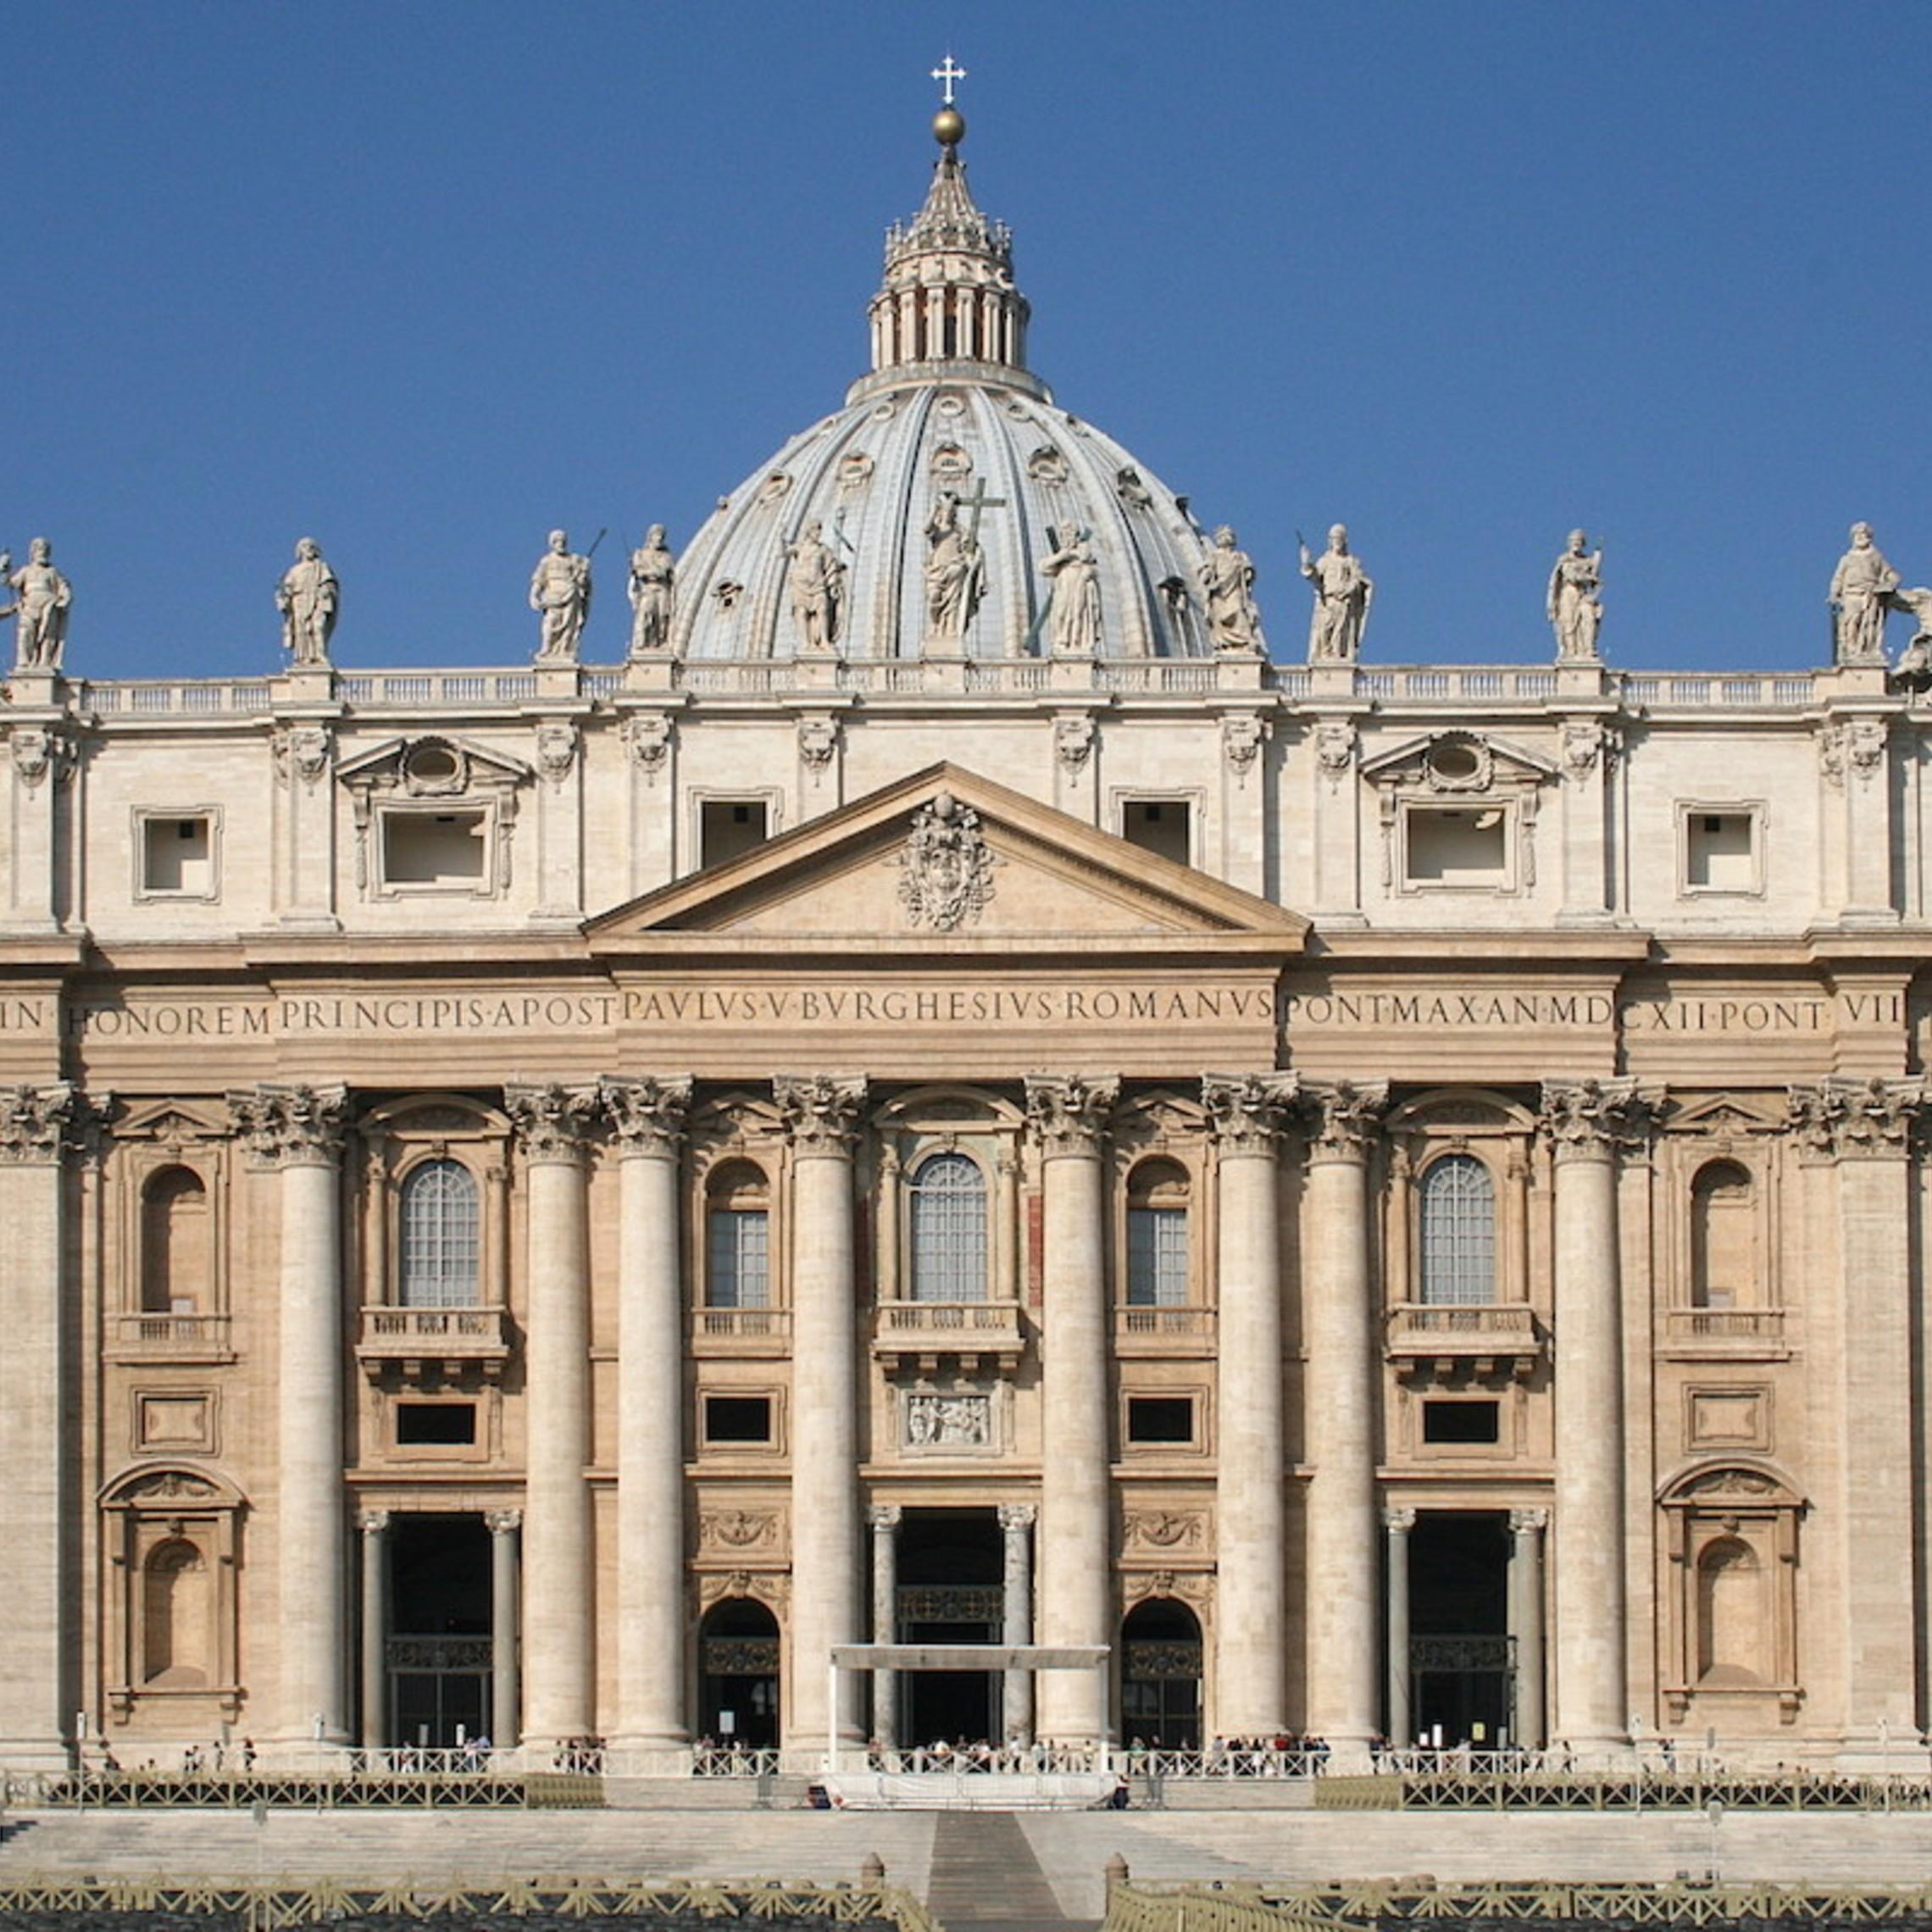 St. Peters Bascilia